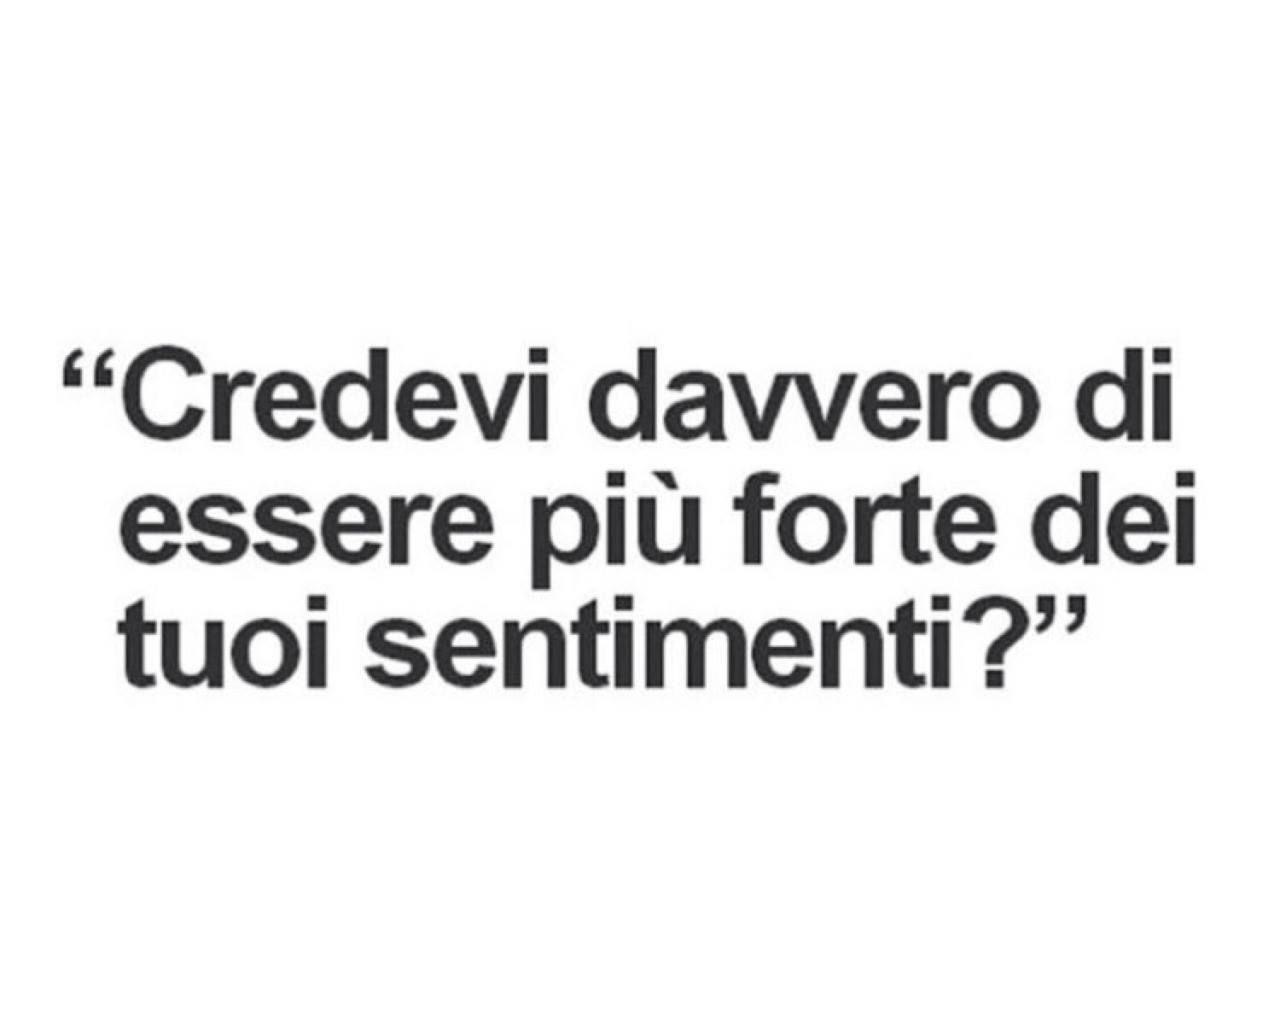 Frasi Frasi Italiane Frasi Belle Frasi Tumblr Image